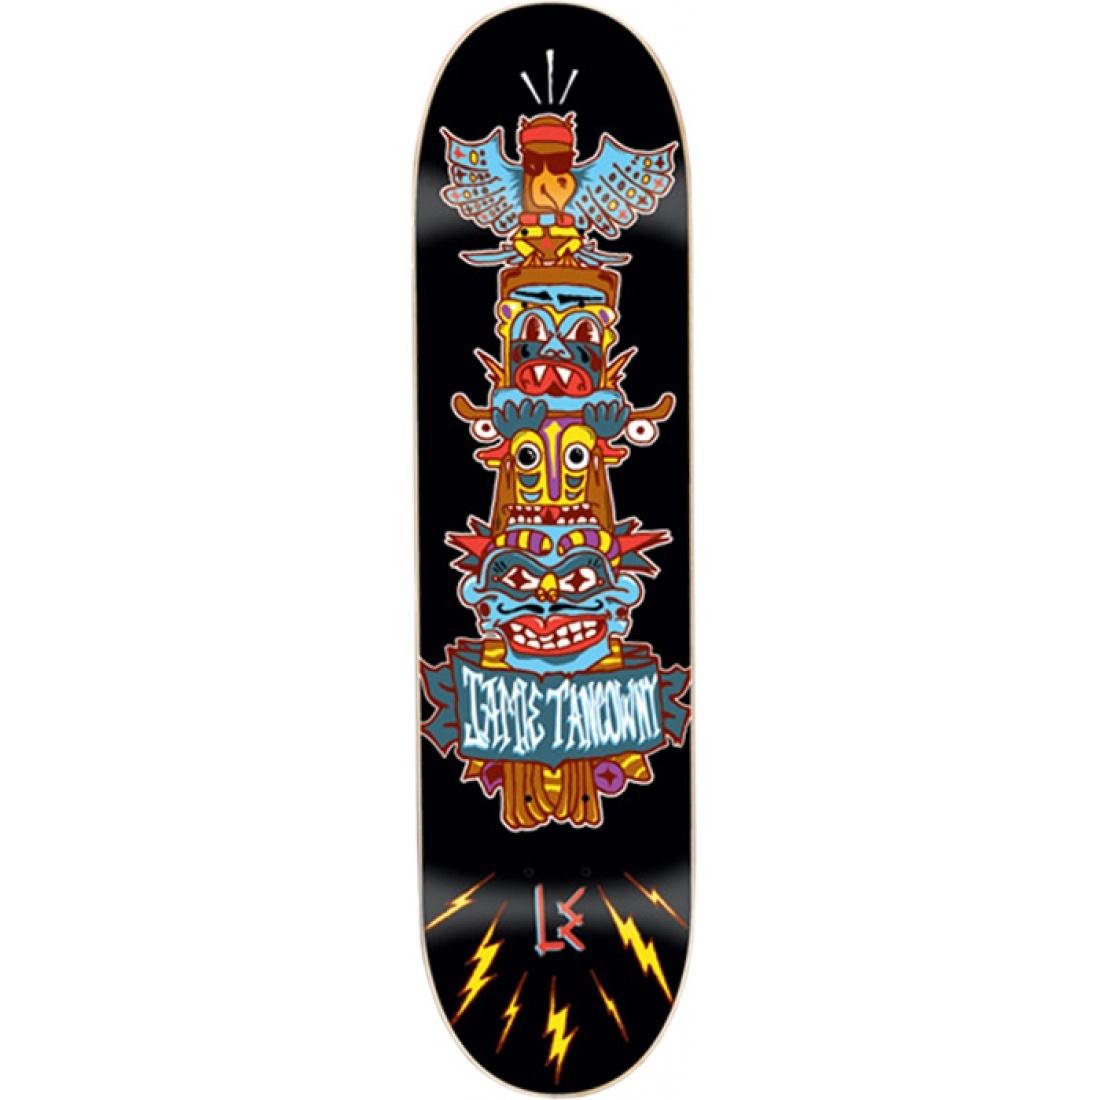 LE-Totem Tancowny 8.25 Deck